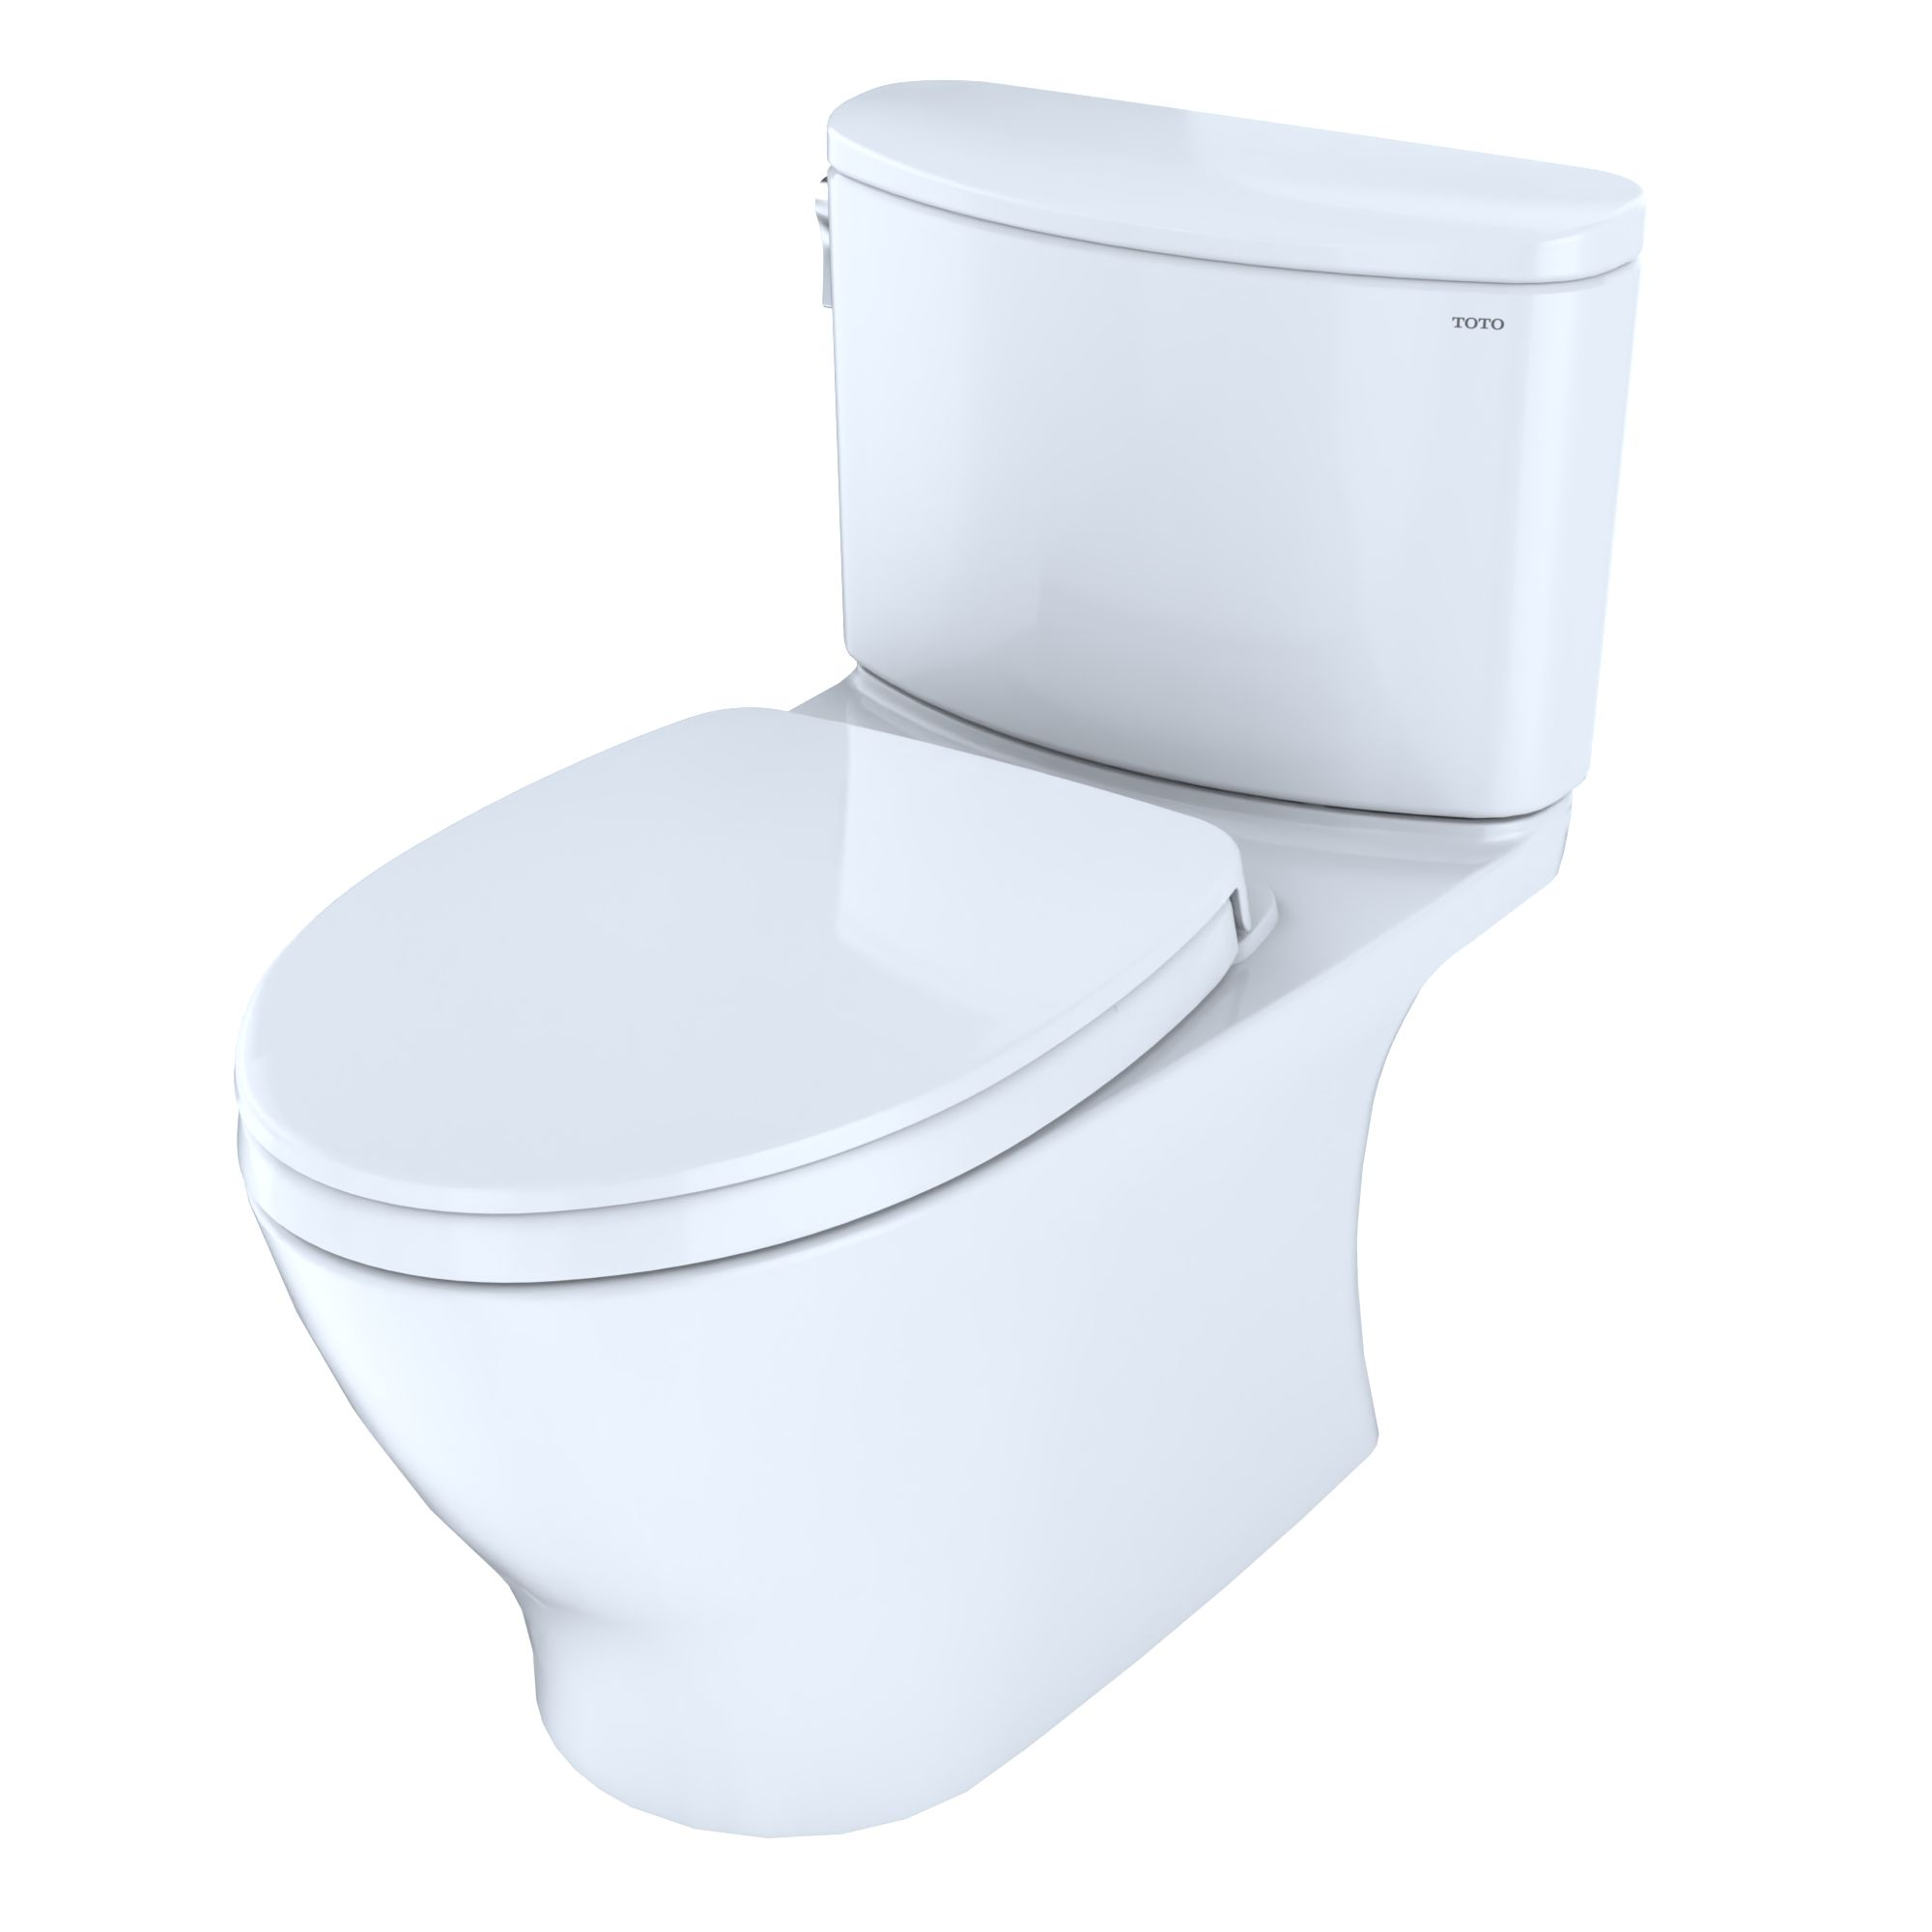 Prime Nexus Two Piece Toilet 1 28 Gpf Elongated Bowl Totousa Com Creativecarmelina Interior Chair Design Creativecarmelinacom